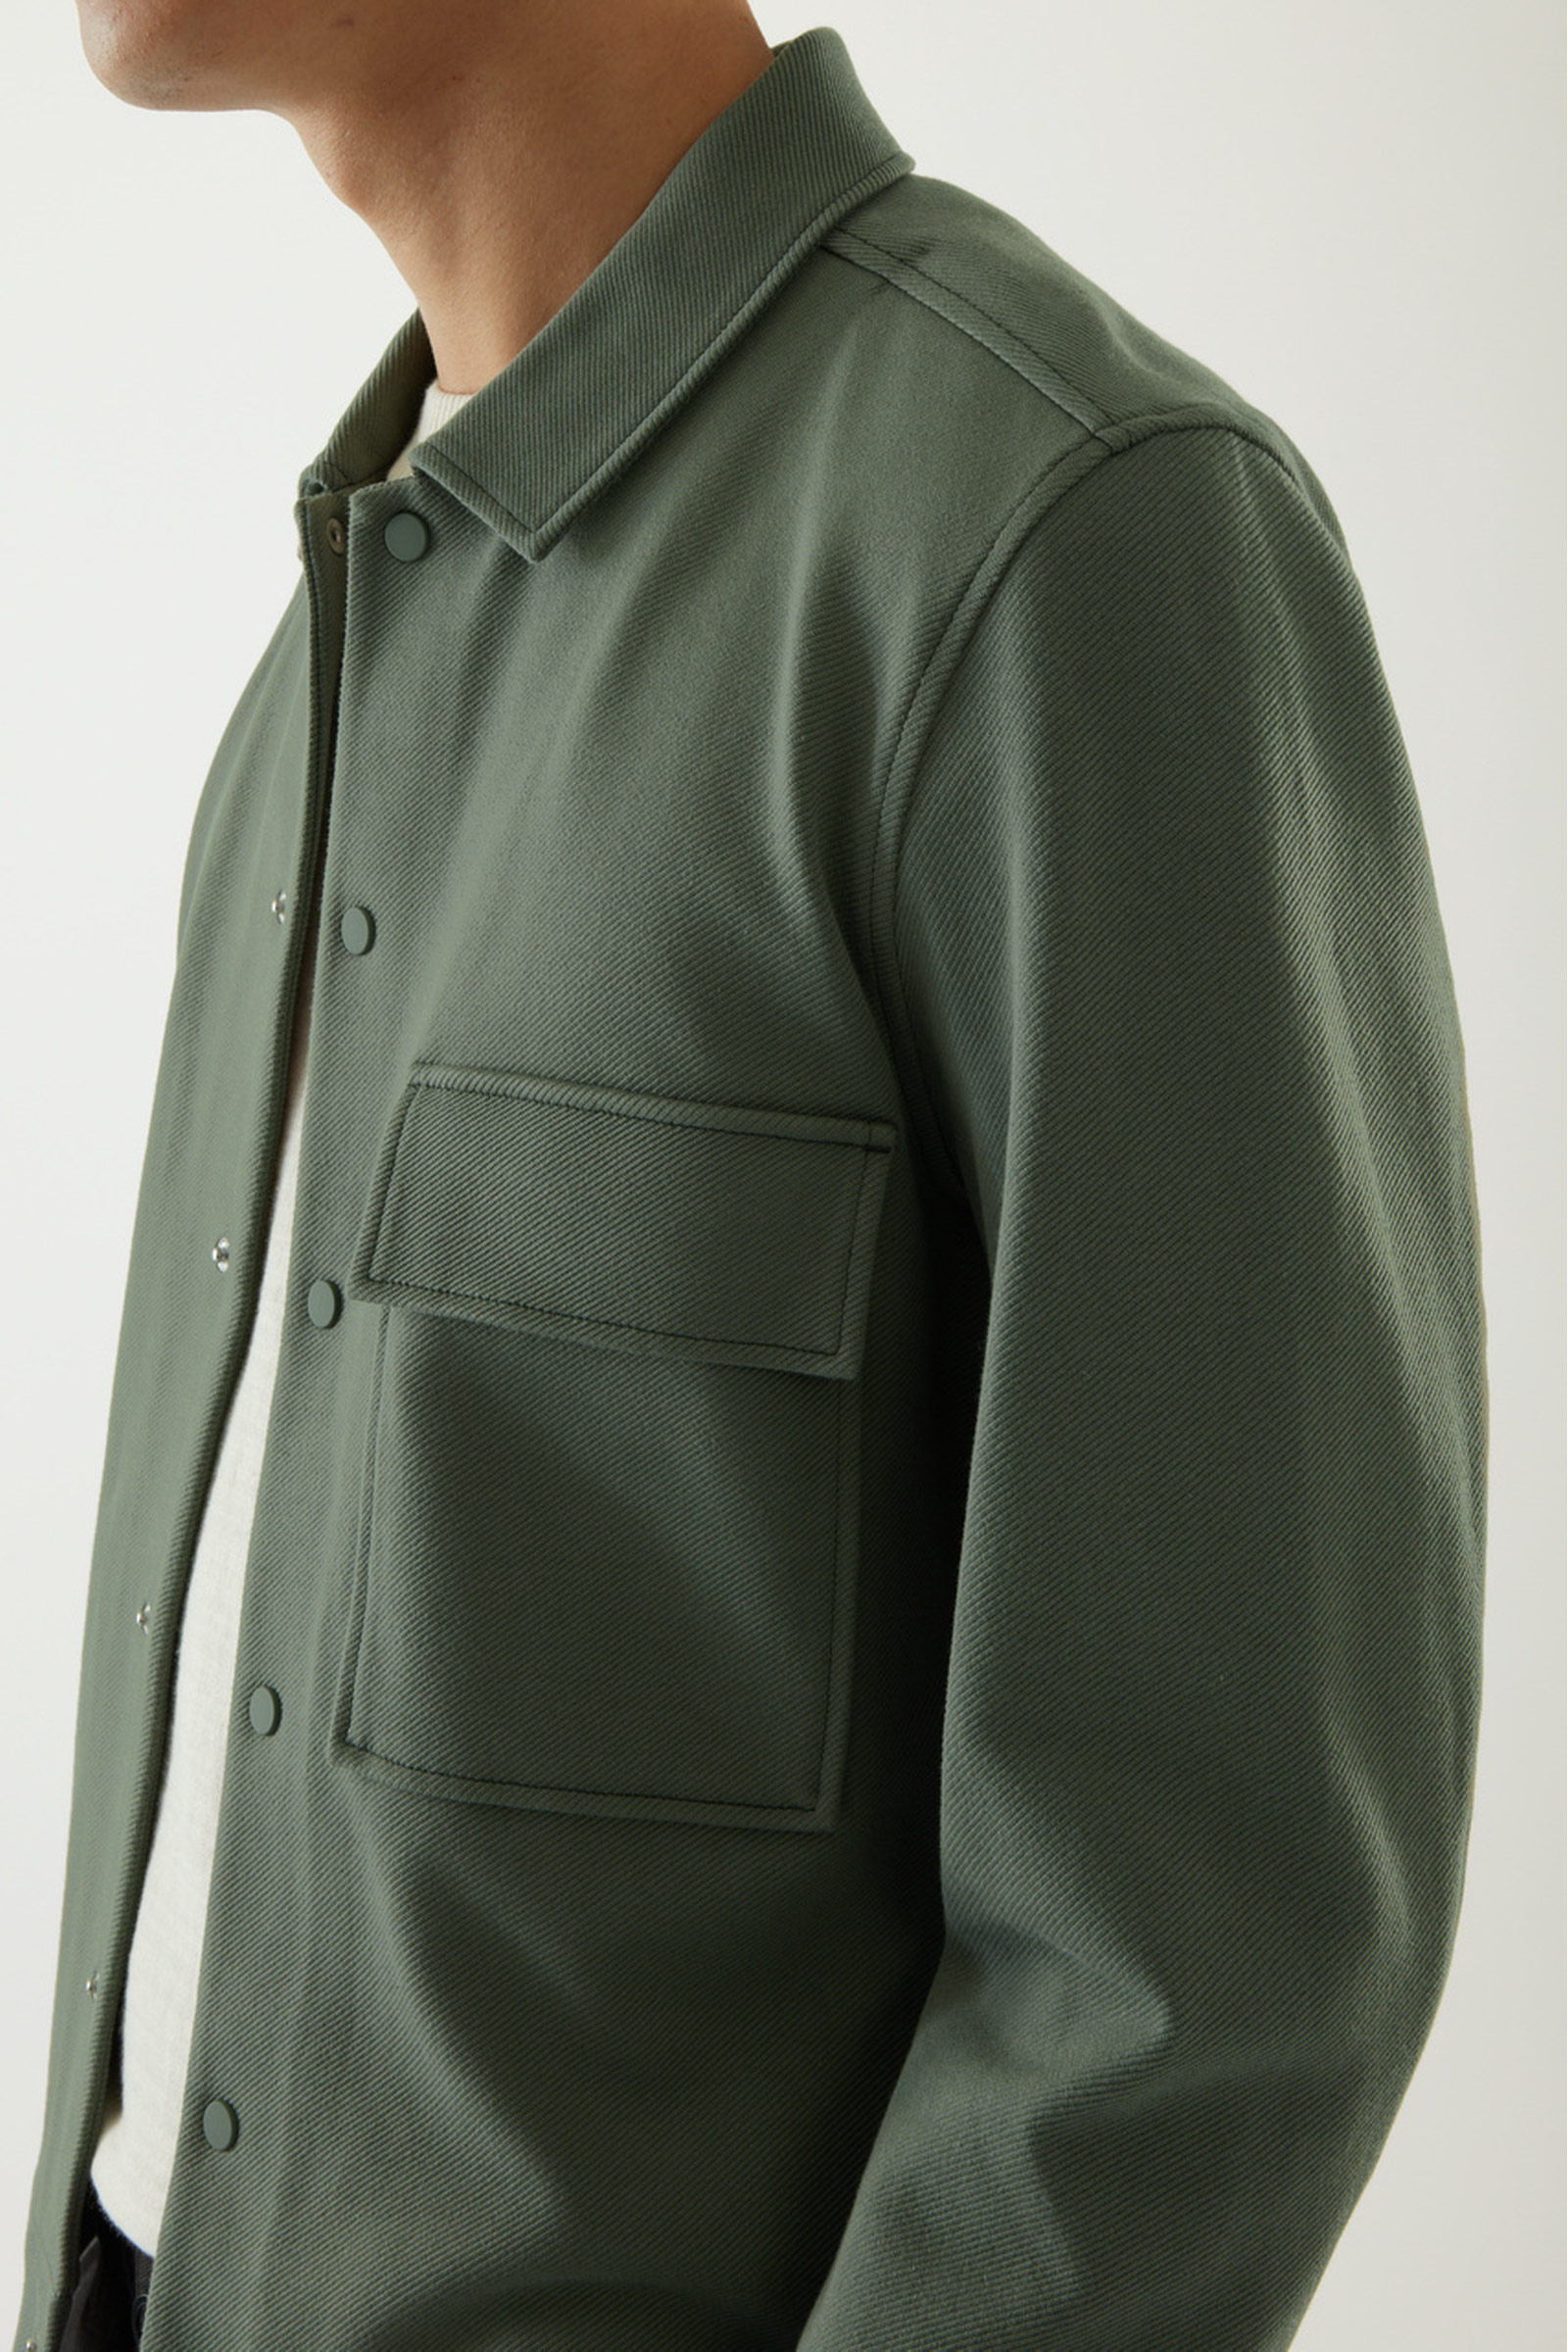 COS 코튼 트윌 셔츠 재킷 의 세이지 그린컬러 ECOMLook입니다.